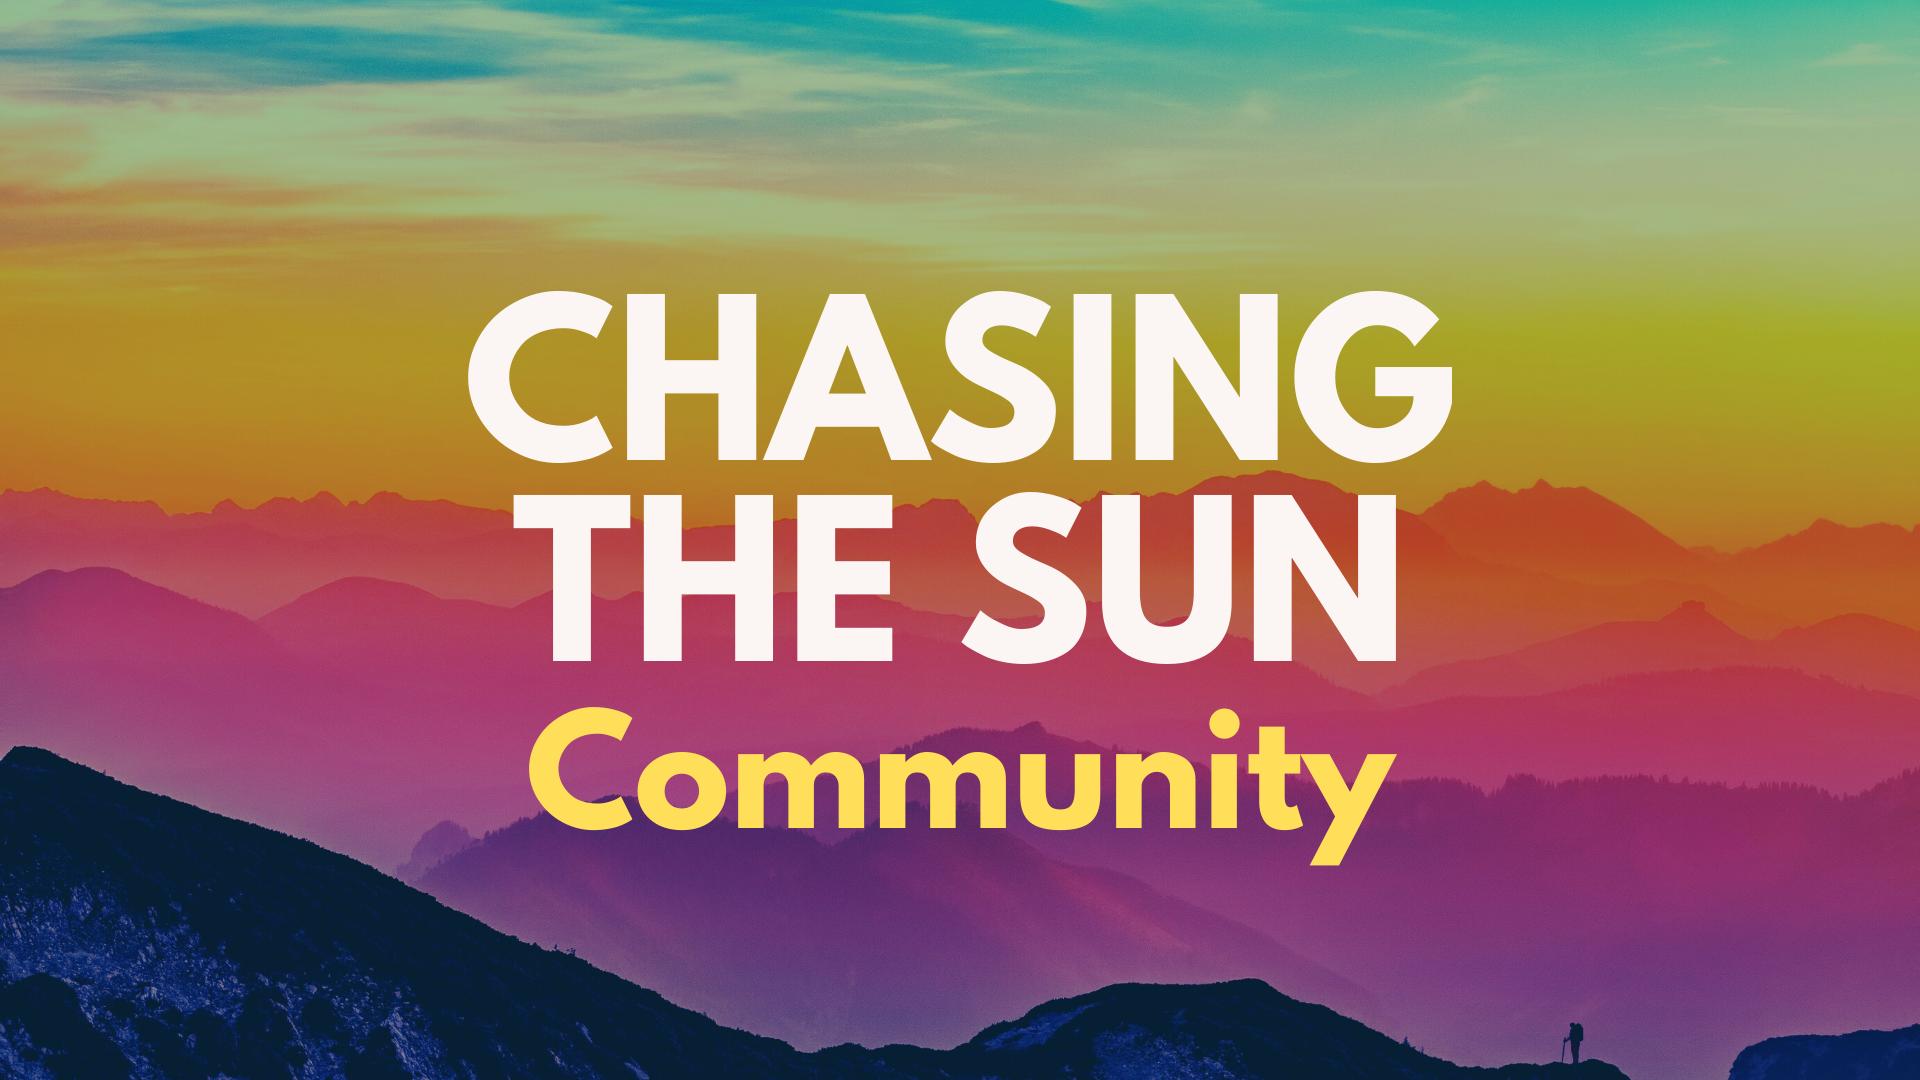 Chasing the Sun Community